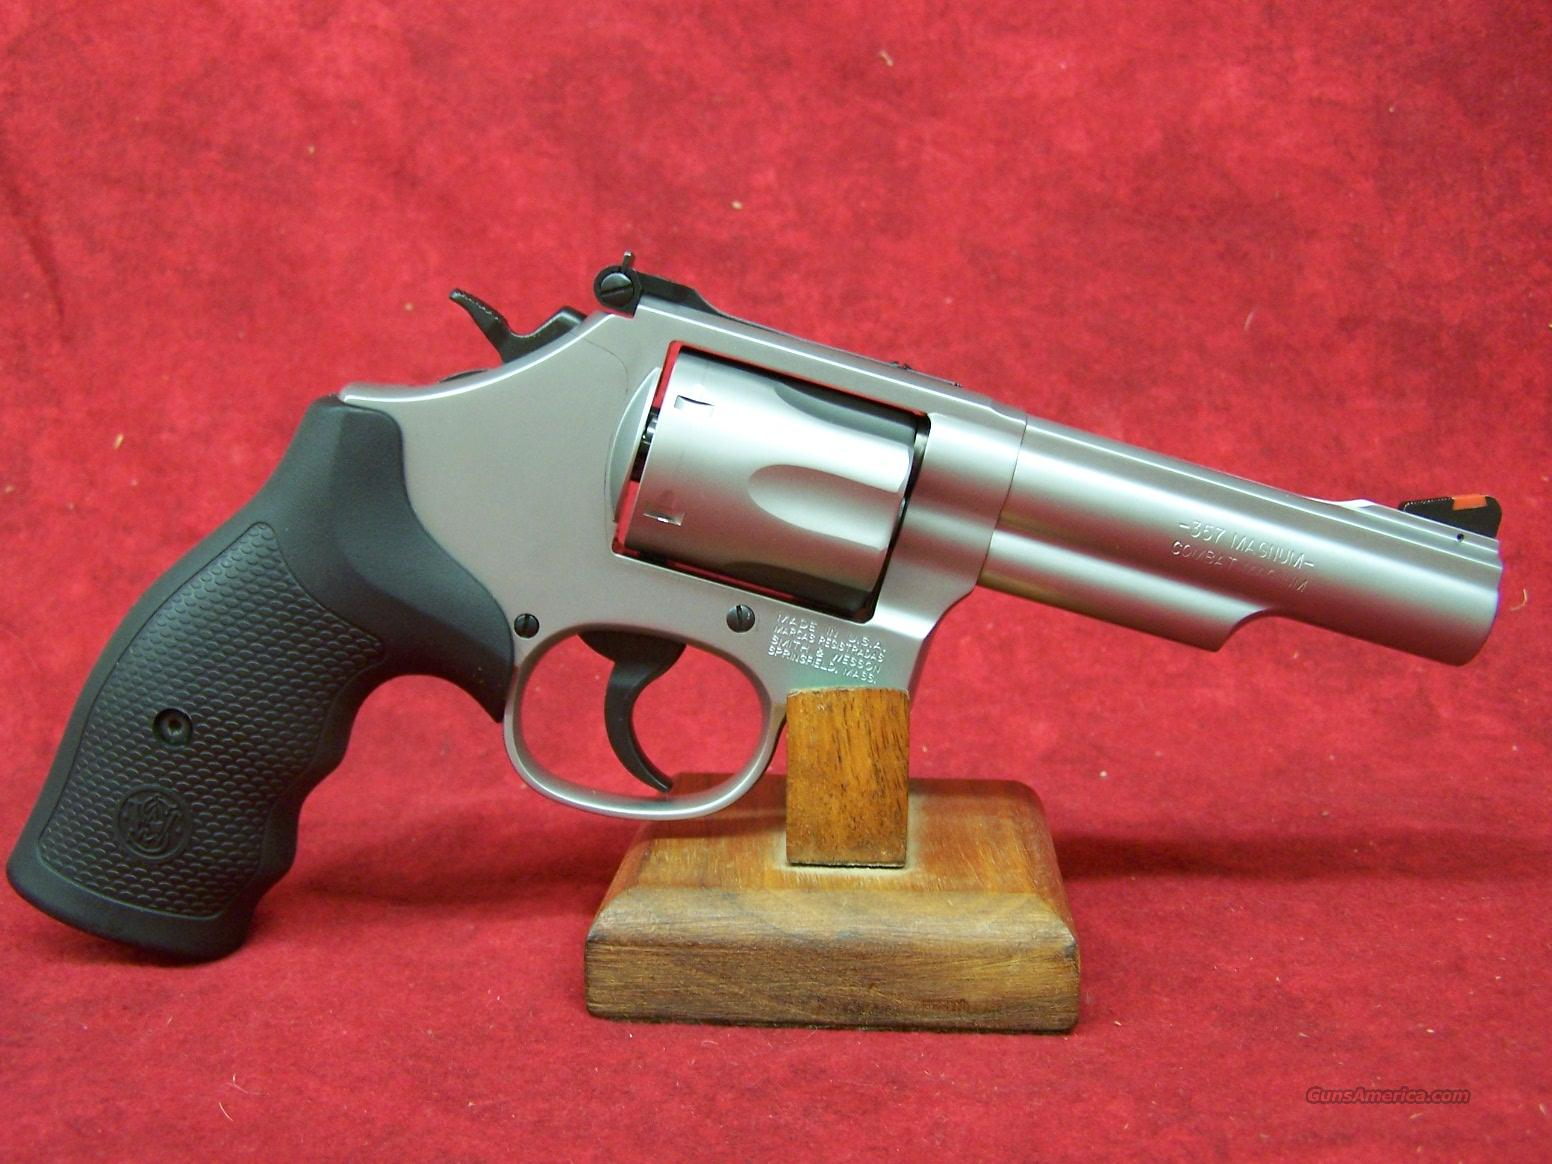 "Smith & Wesson 66-8 SS 4.25"" .357mag (162662)  Guns > Pistols > Smith & Wesson Revolvers > Full Frame Revolver"